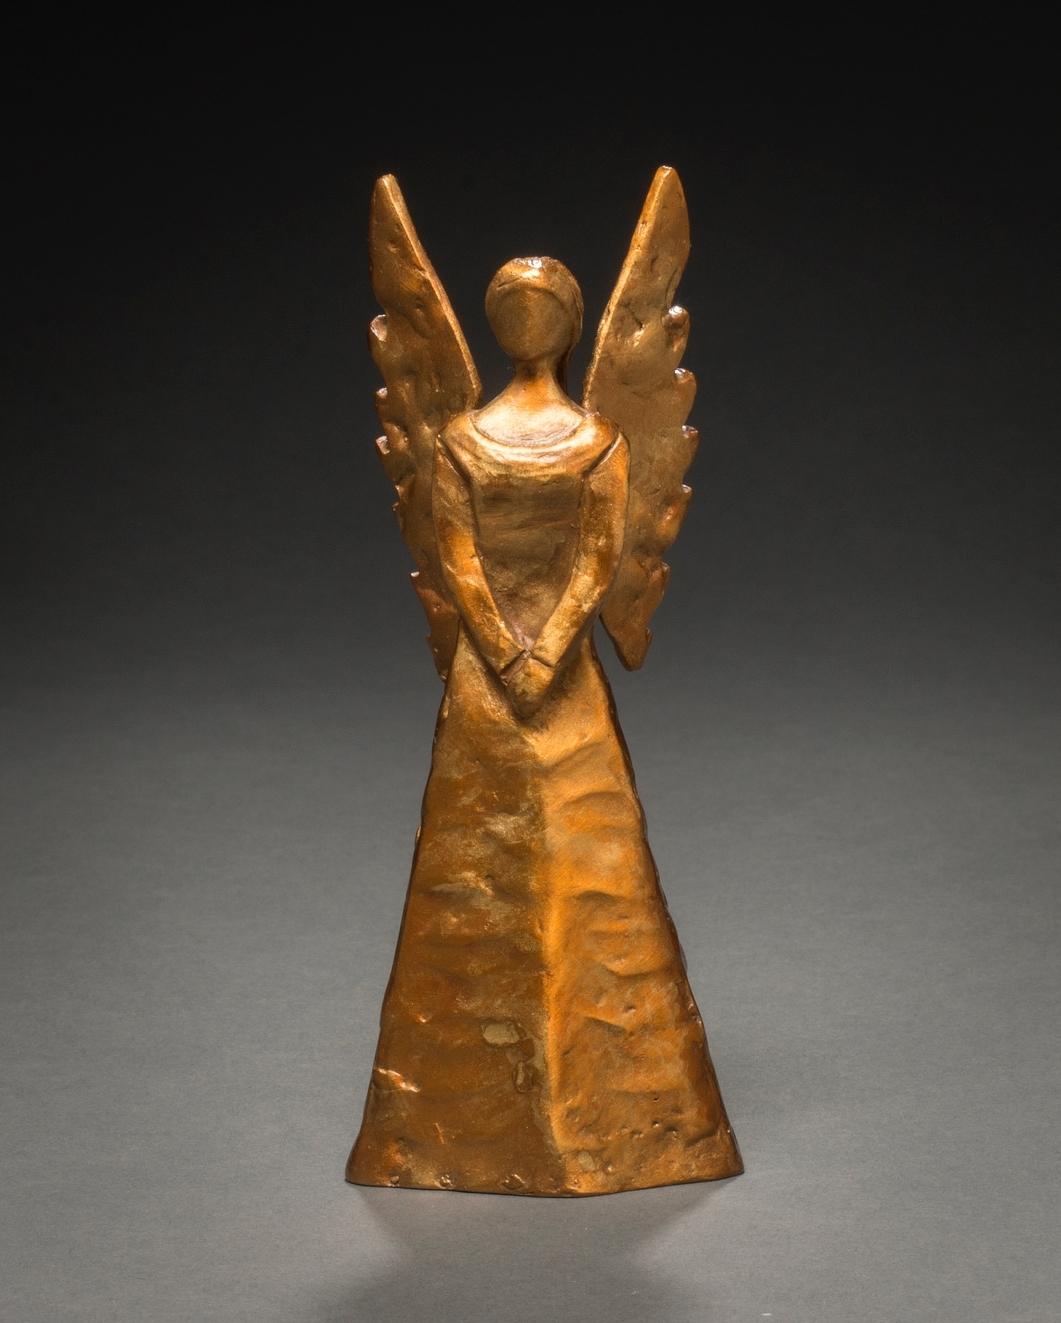 Contemplation   4 ''H x 2 ''D x 2 ''W Edition of 50, Bronze